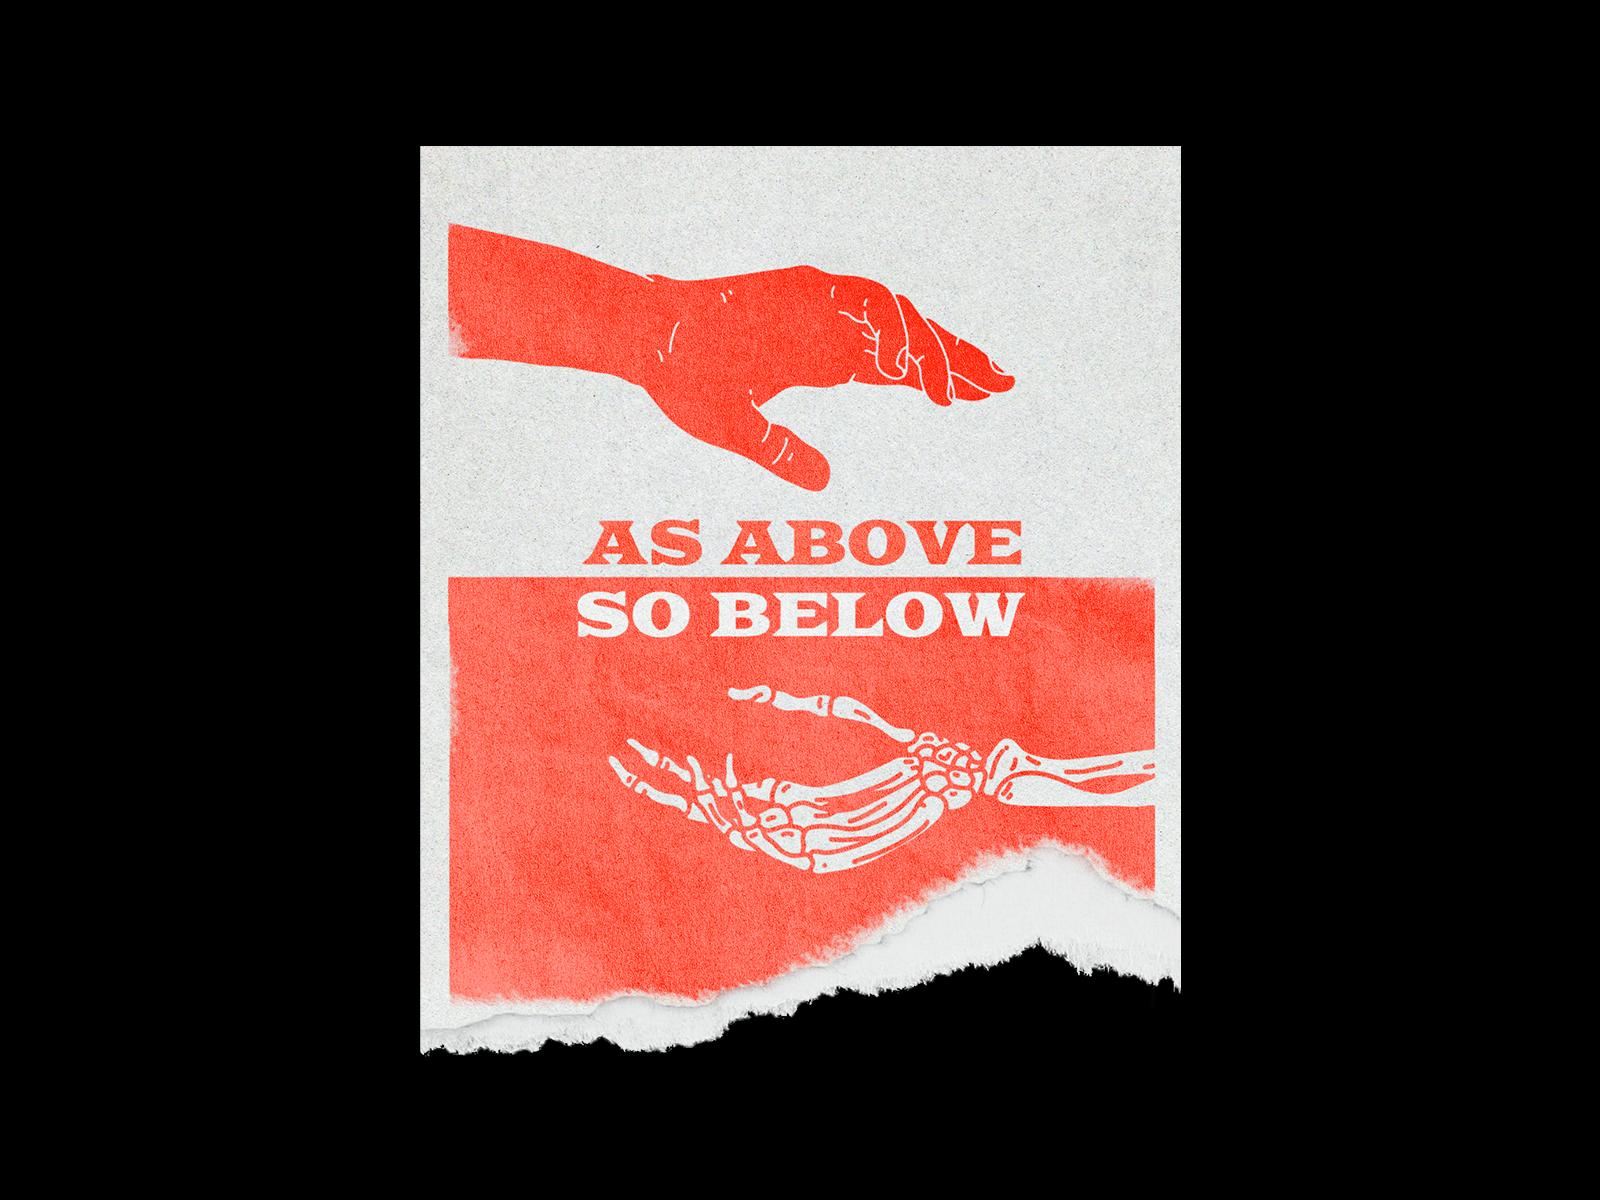 170 As Above So Below By Narry Viɴceɴt On Dribbble